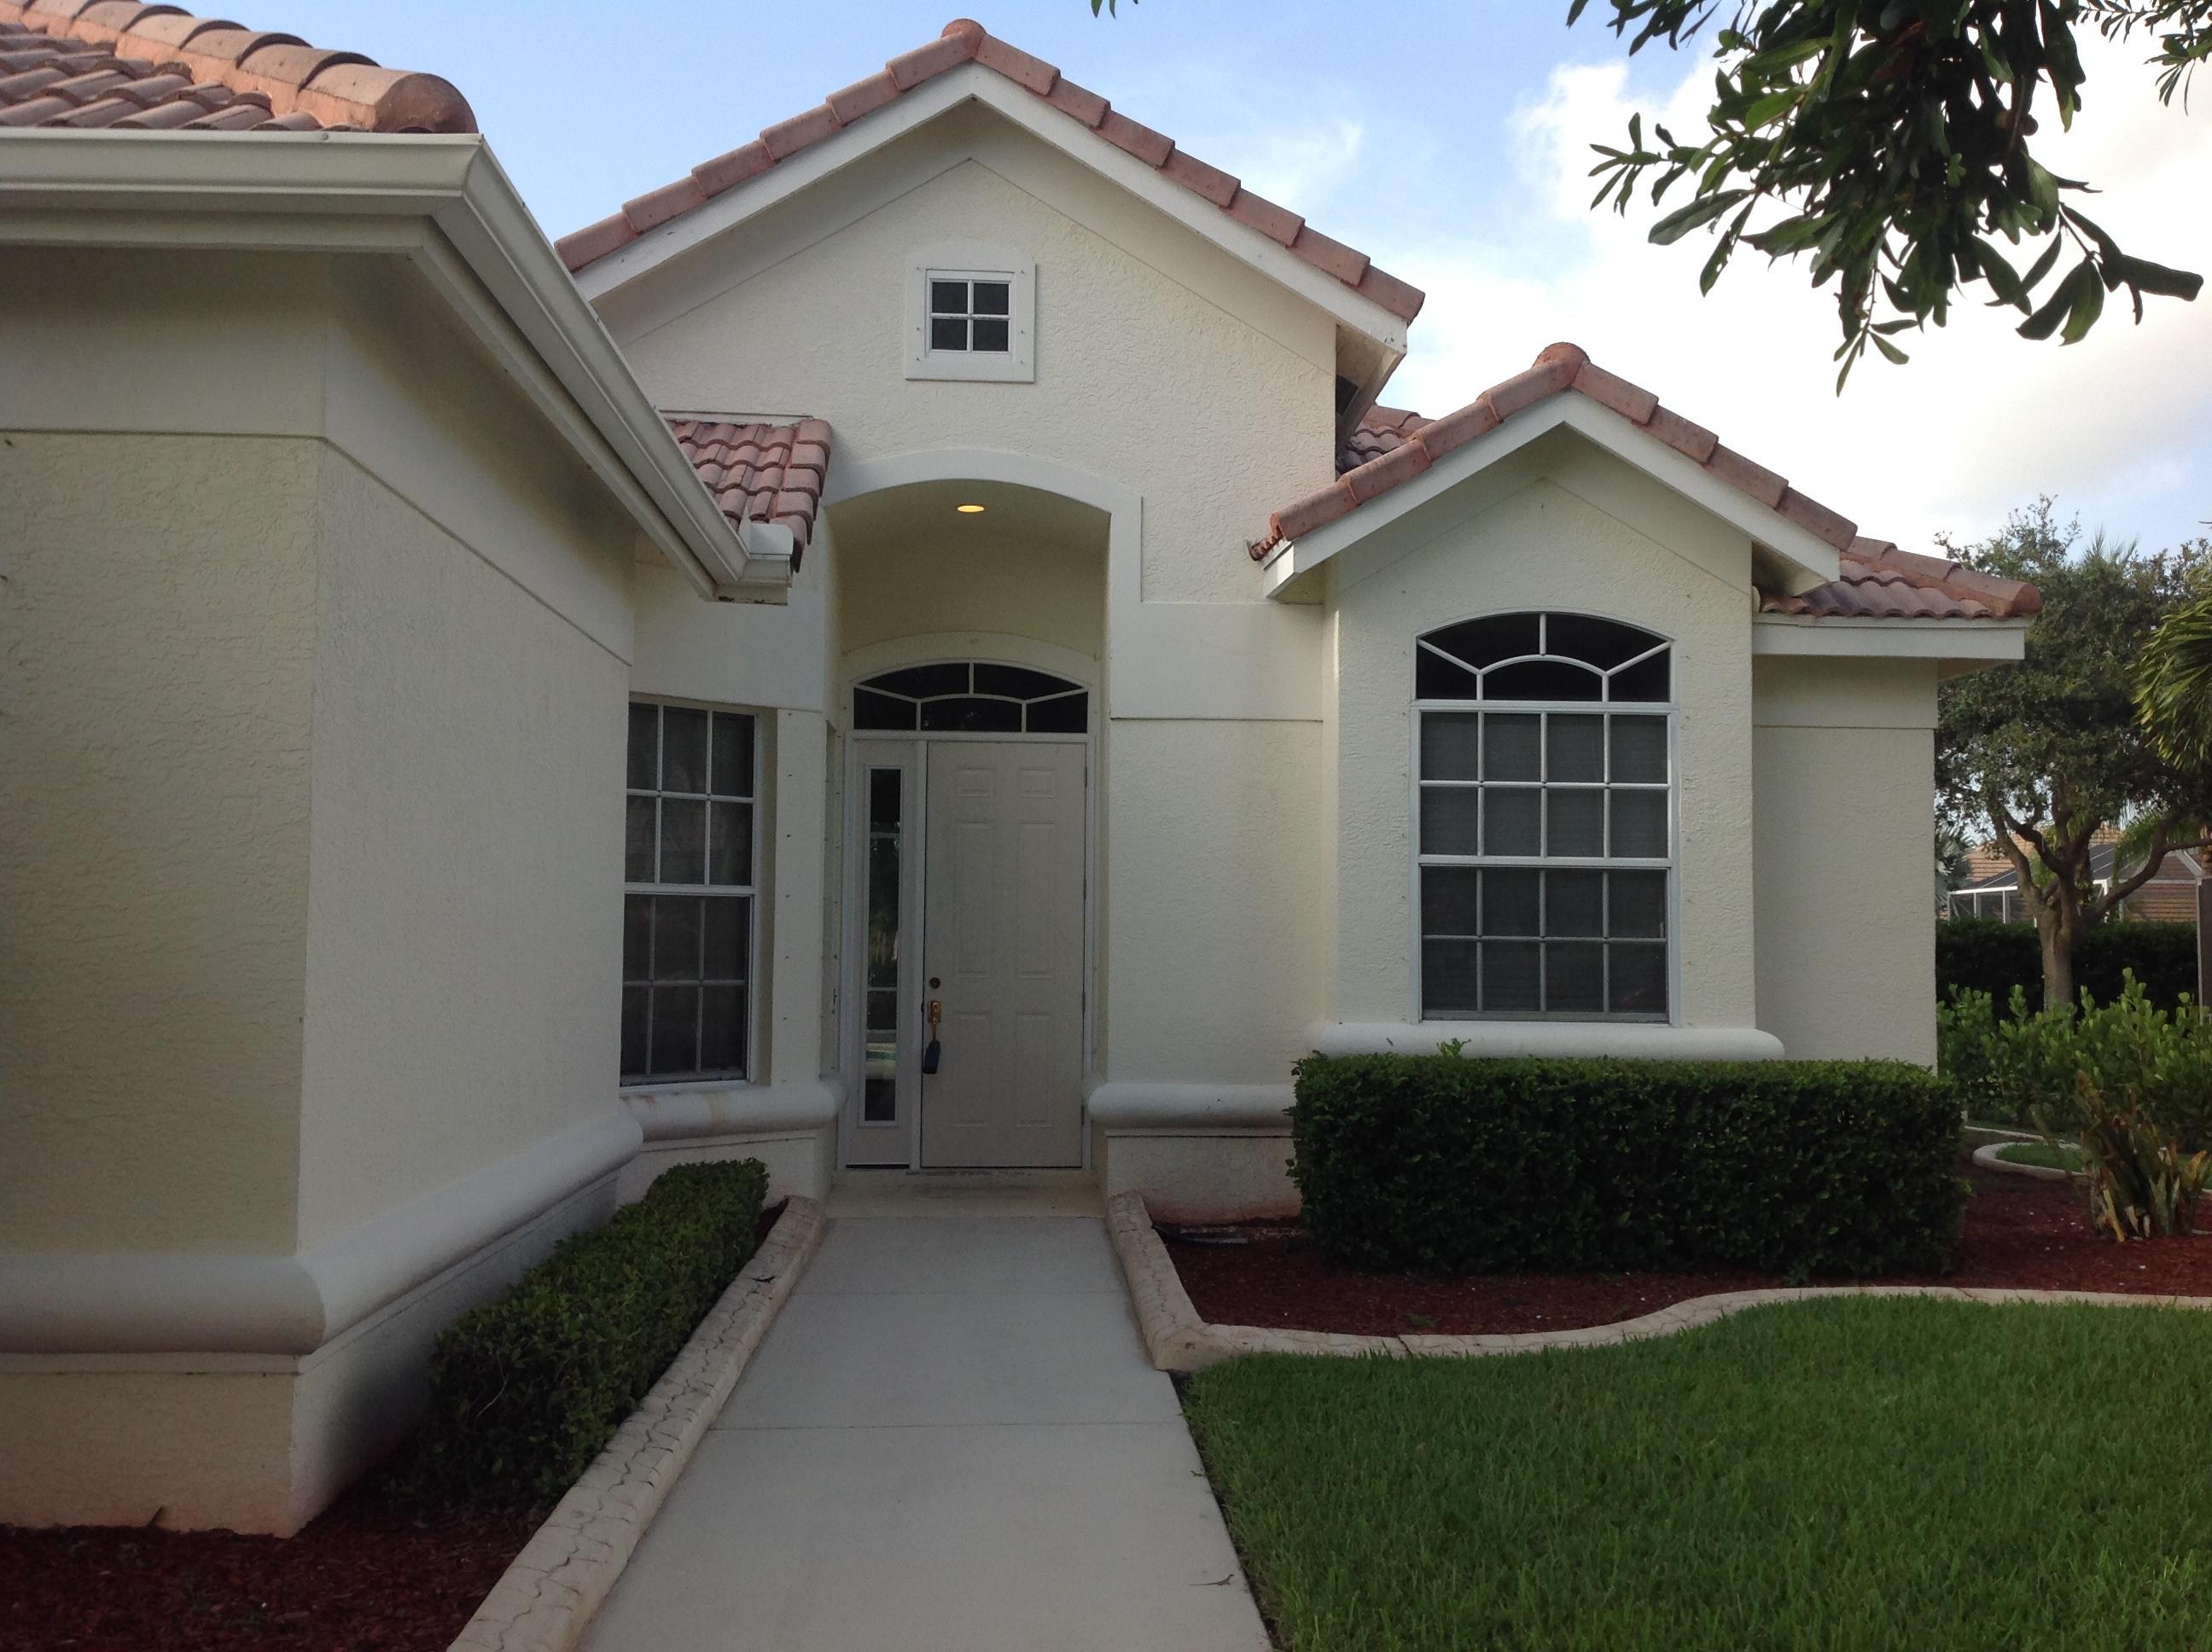 1287 Sw Briarwood Drive, Port Saint Lucie, FL 34986